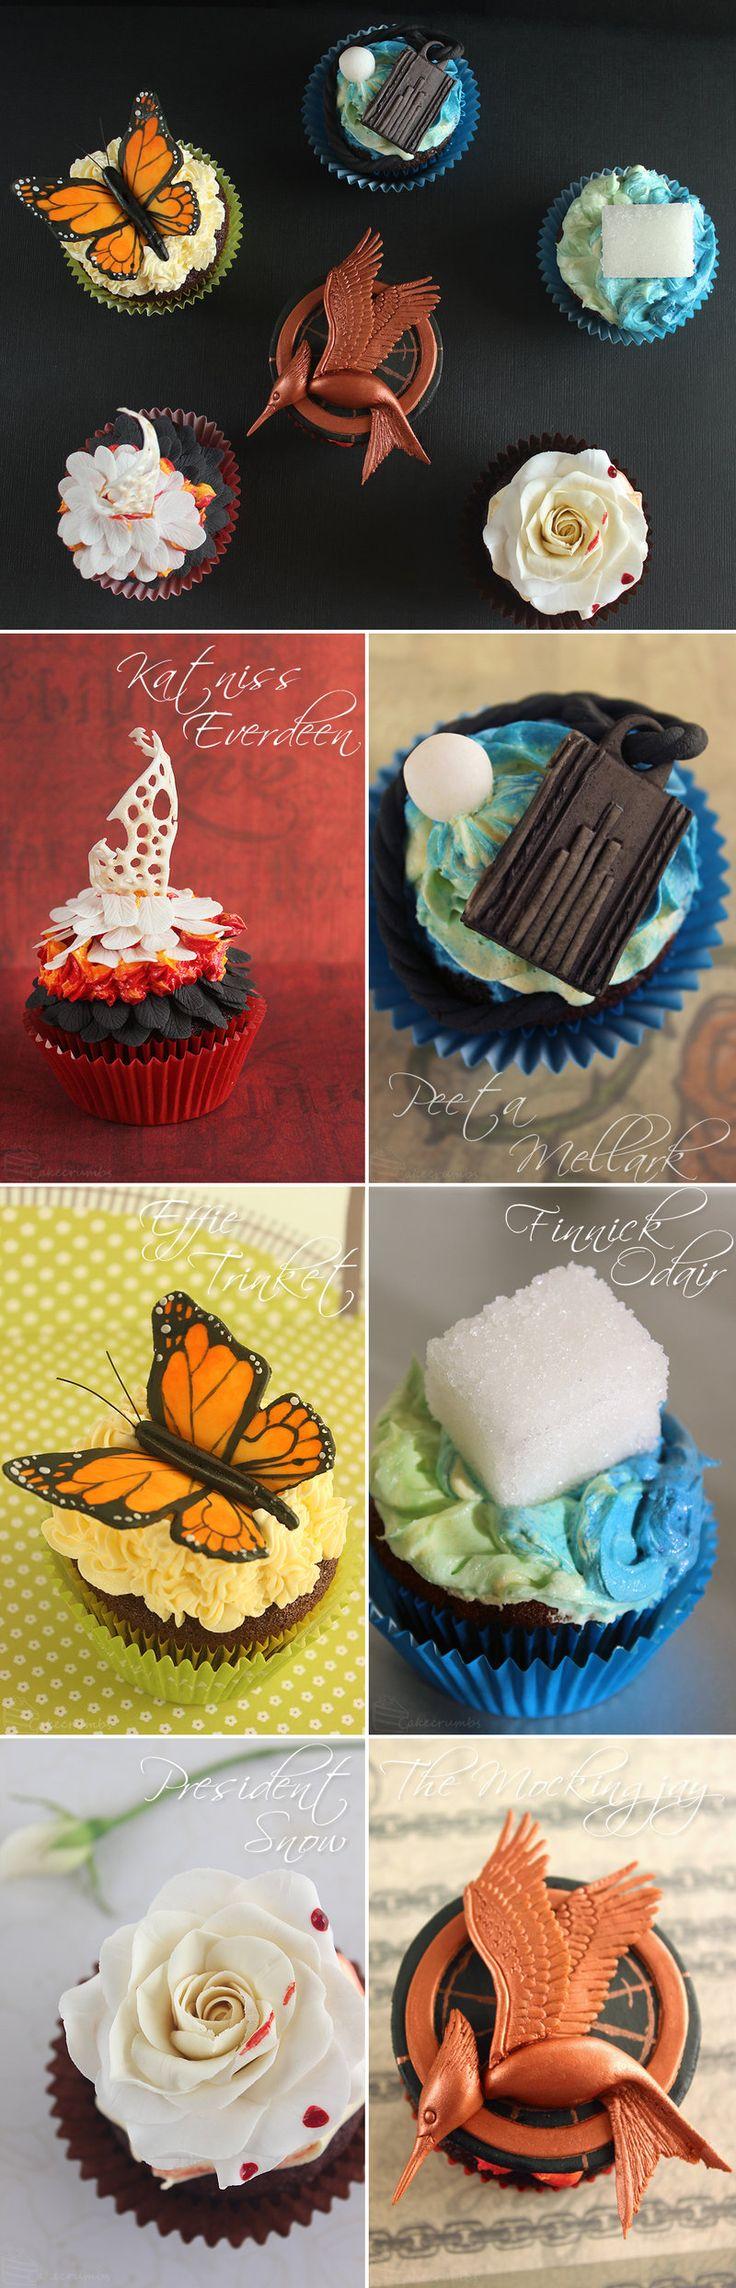 The Hunger Games: Catching Fire Cupcakes by cakecrumbs.deviantart.com on @deviantART